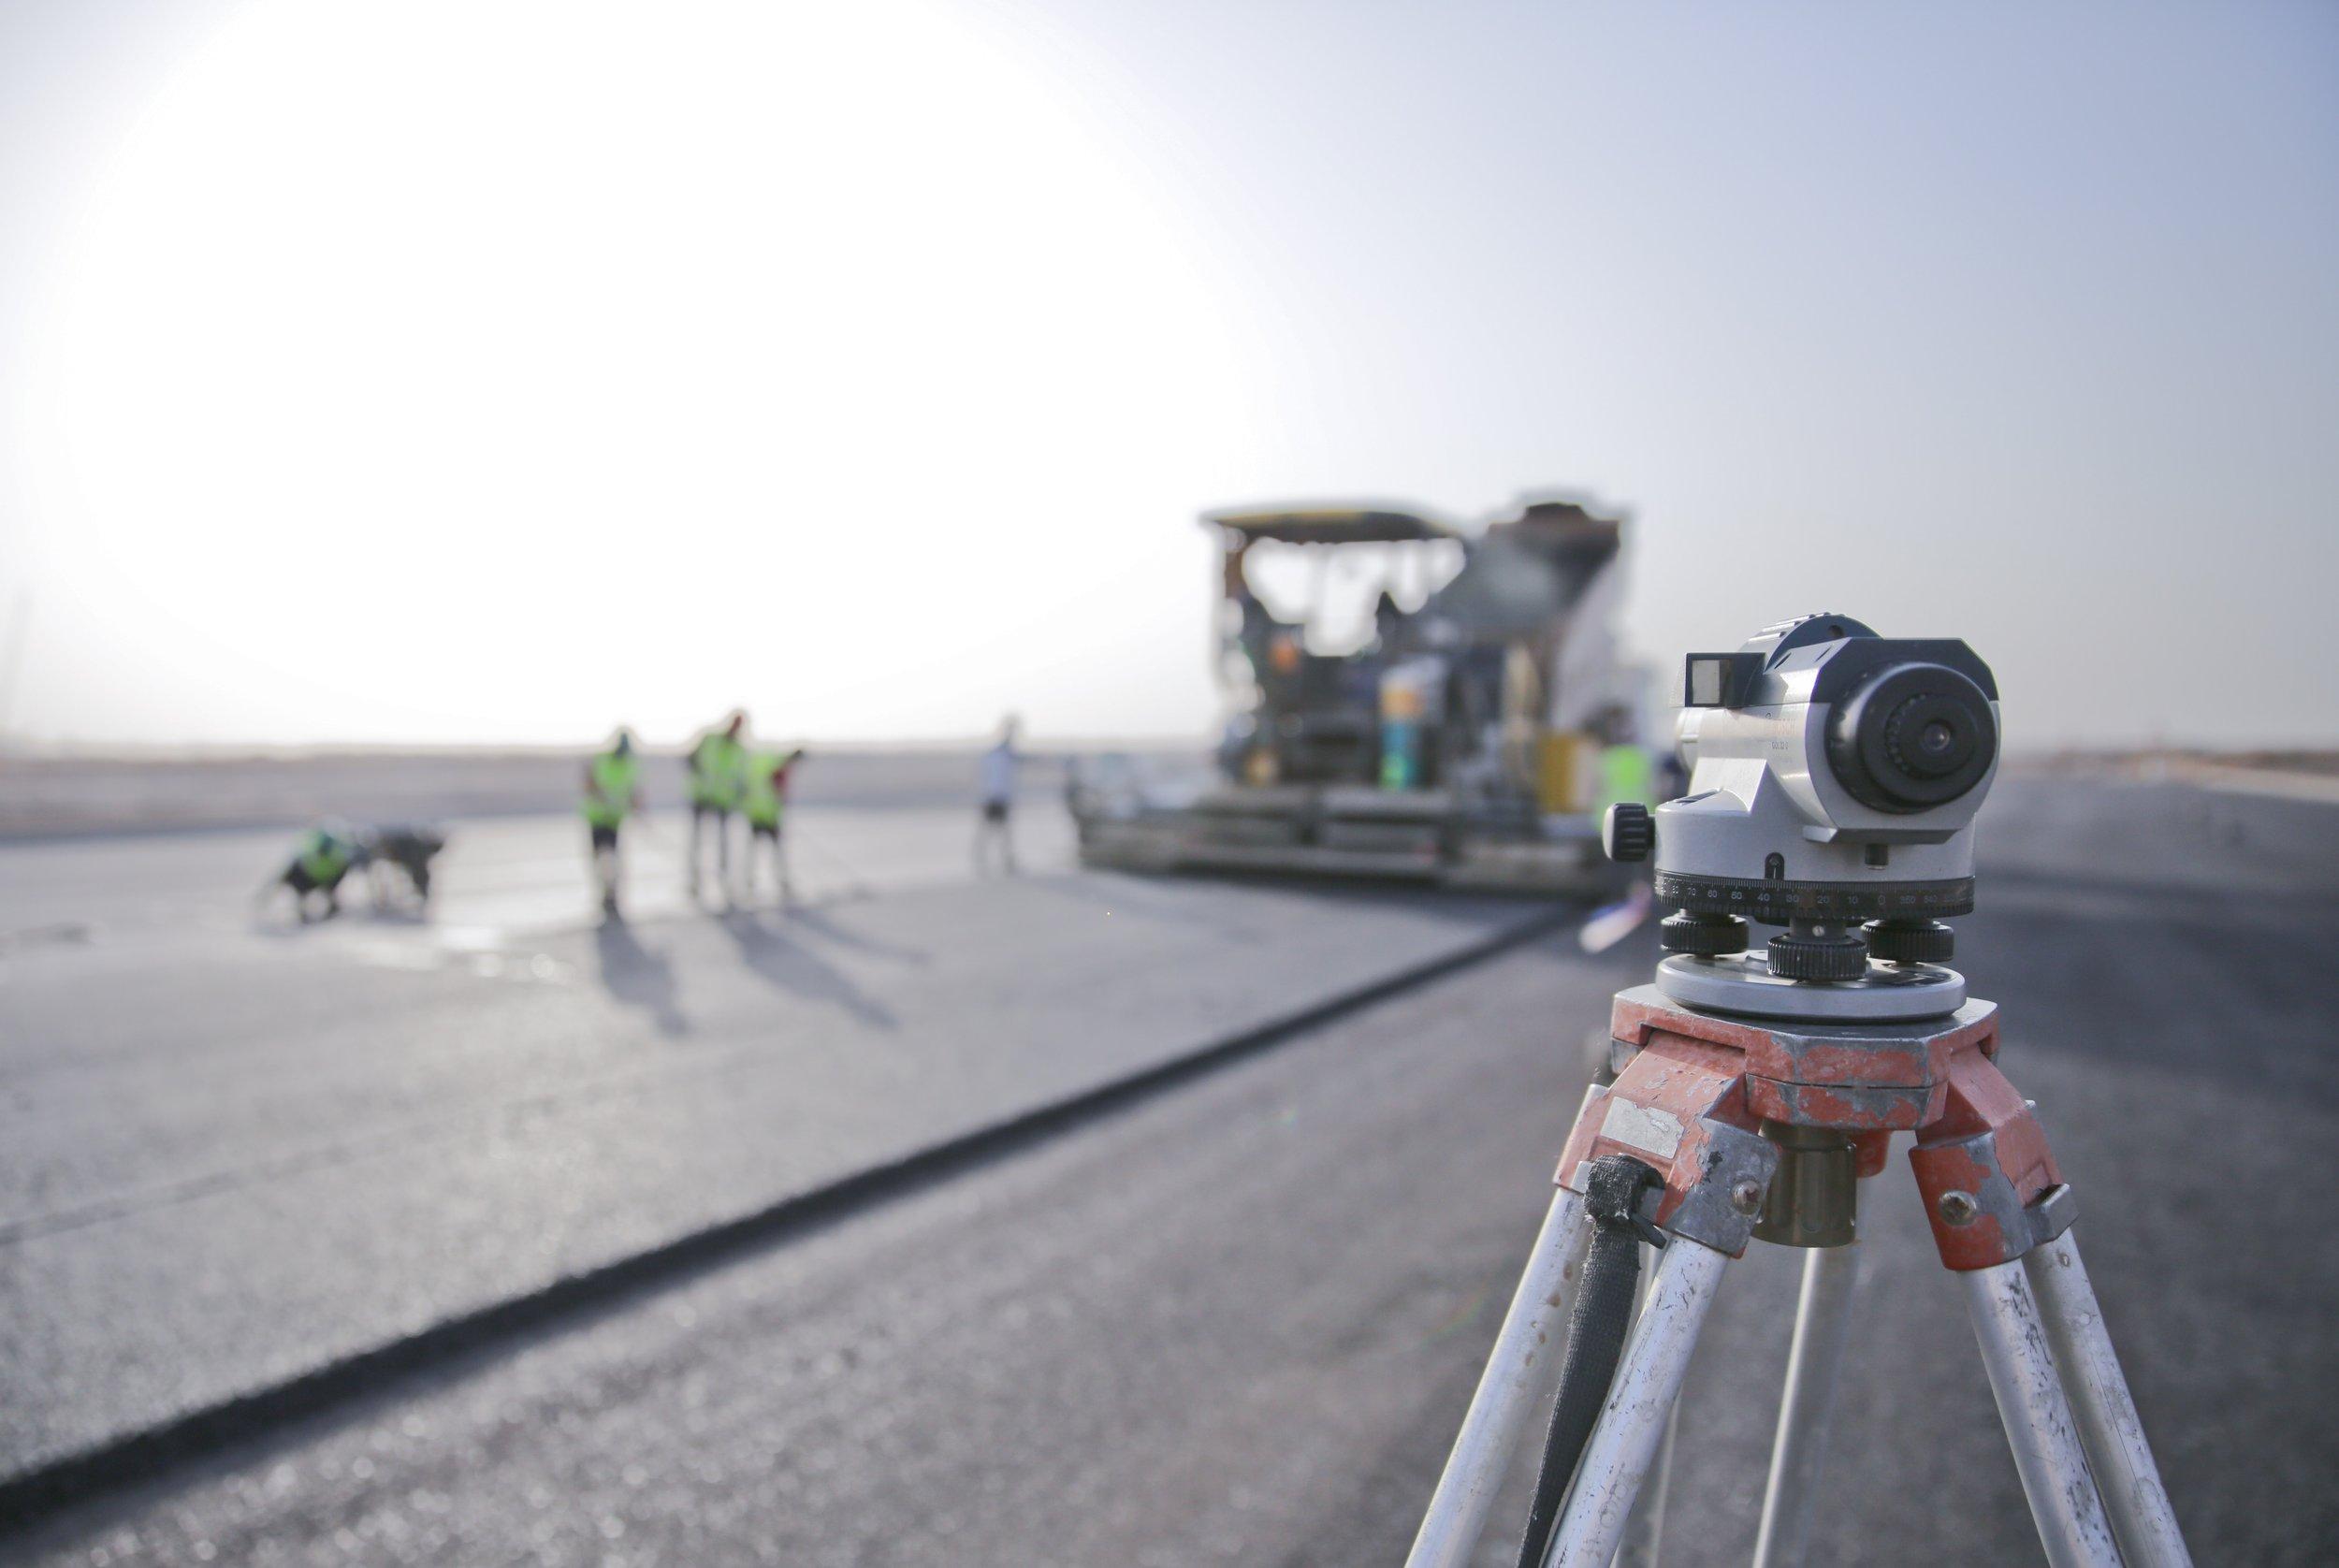 action-asphalt-binoculars-1314322.jpg